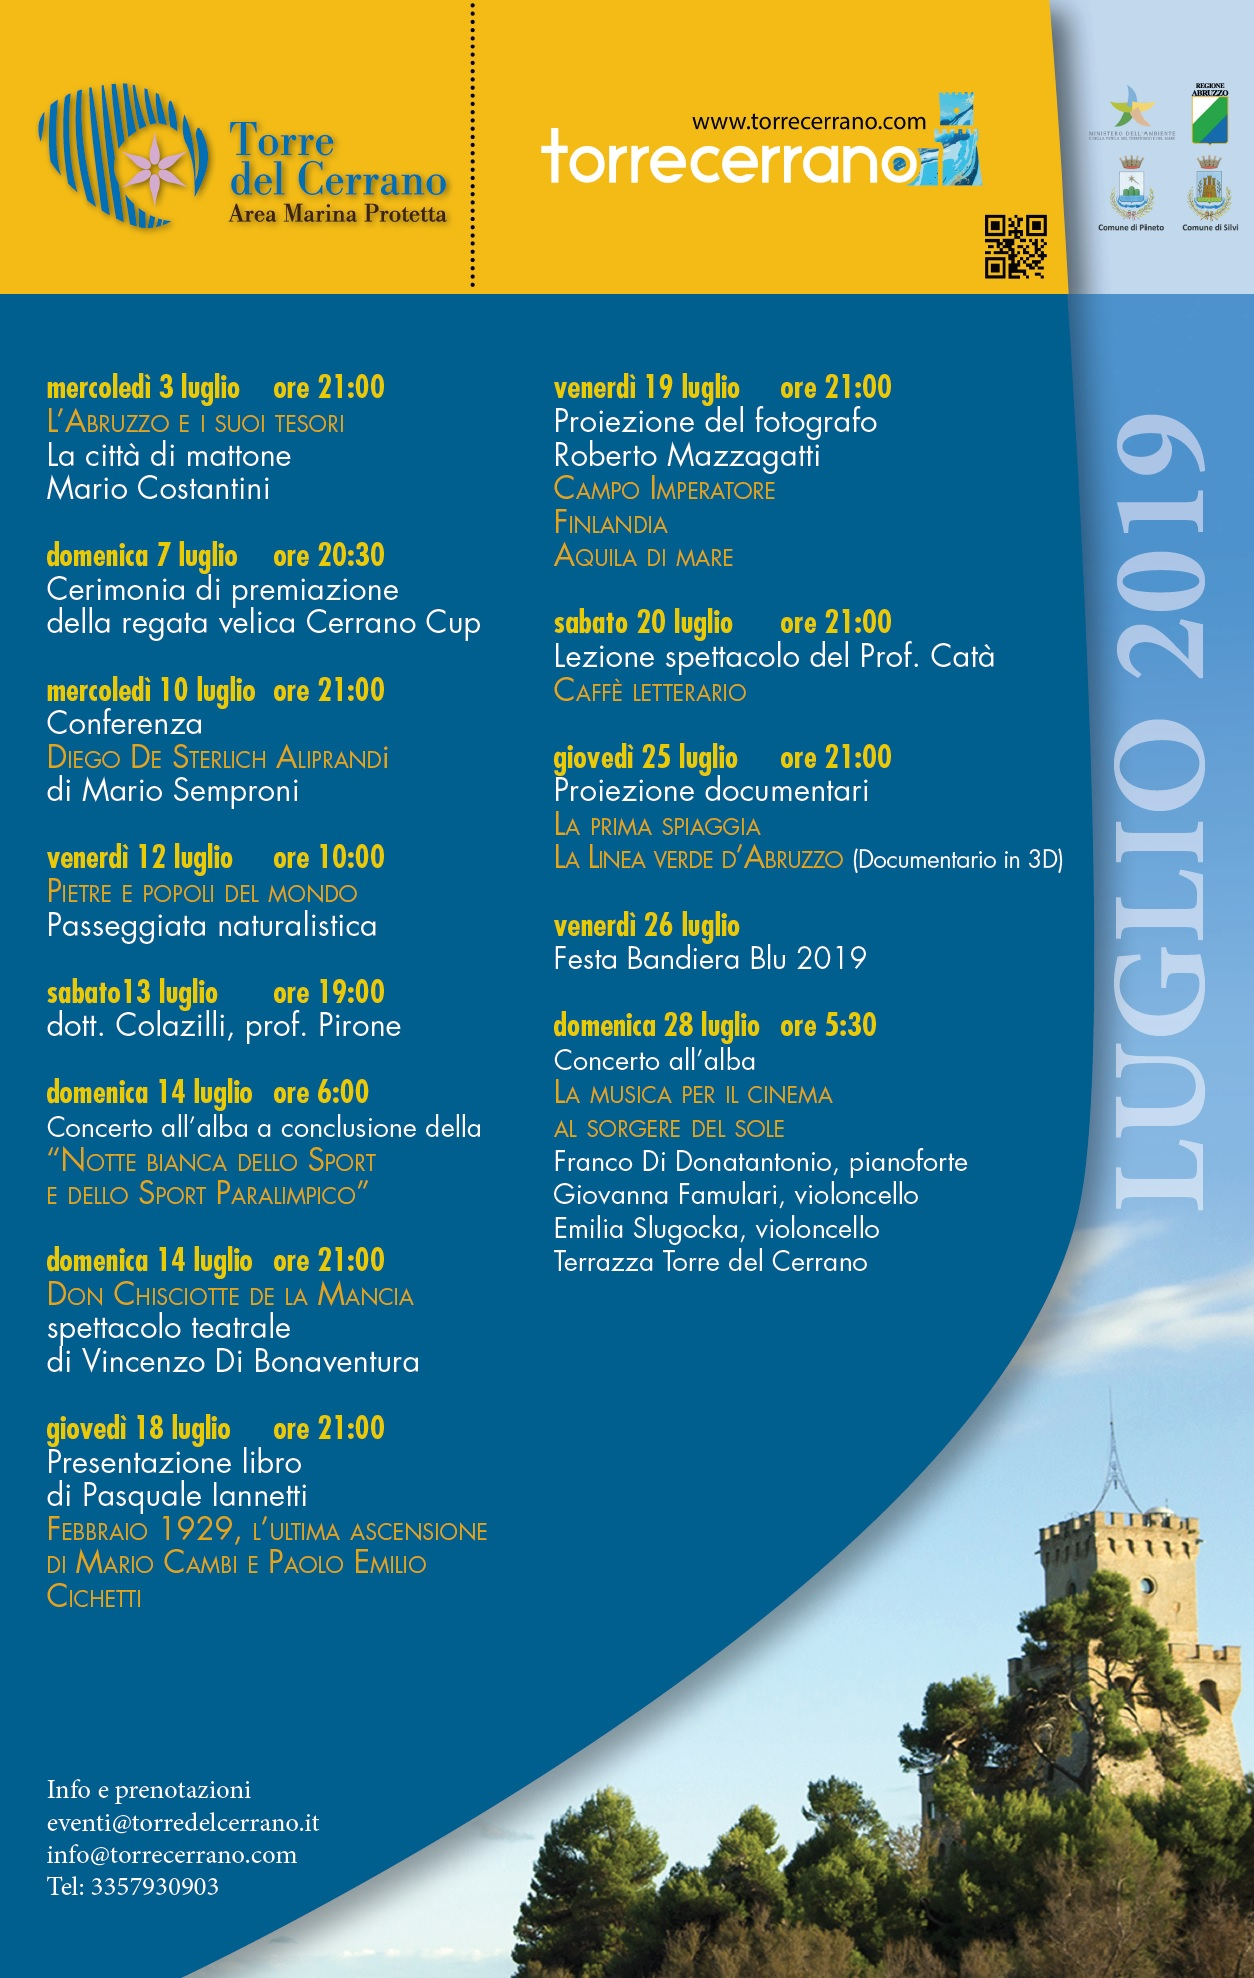 Teramo Ambiente Calendario.Calendario Eventi Torre Cerrano Torre Del Cerrano